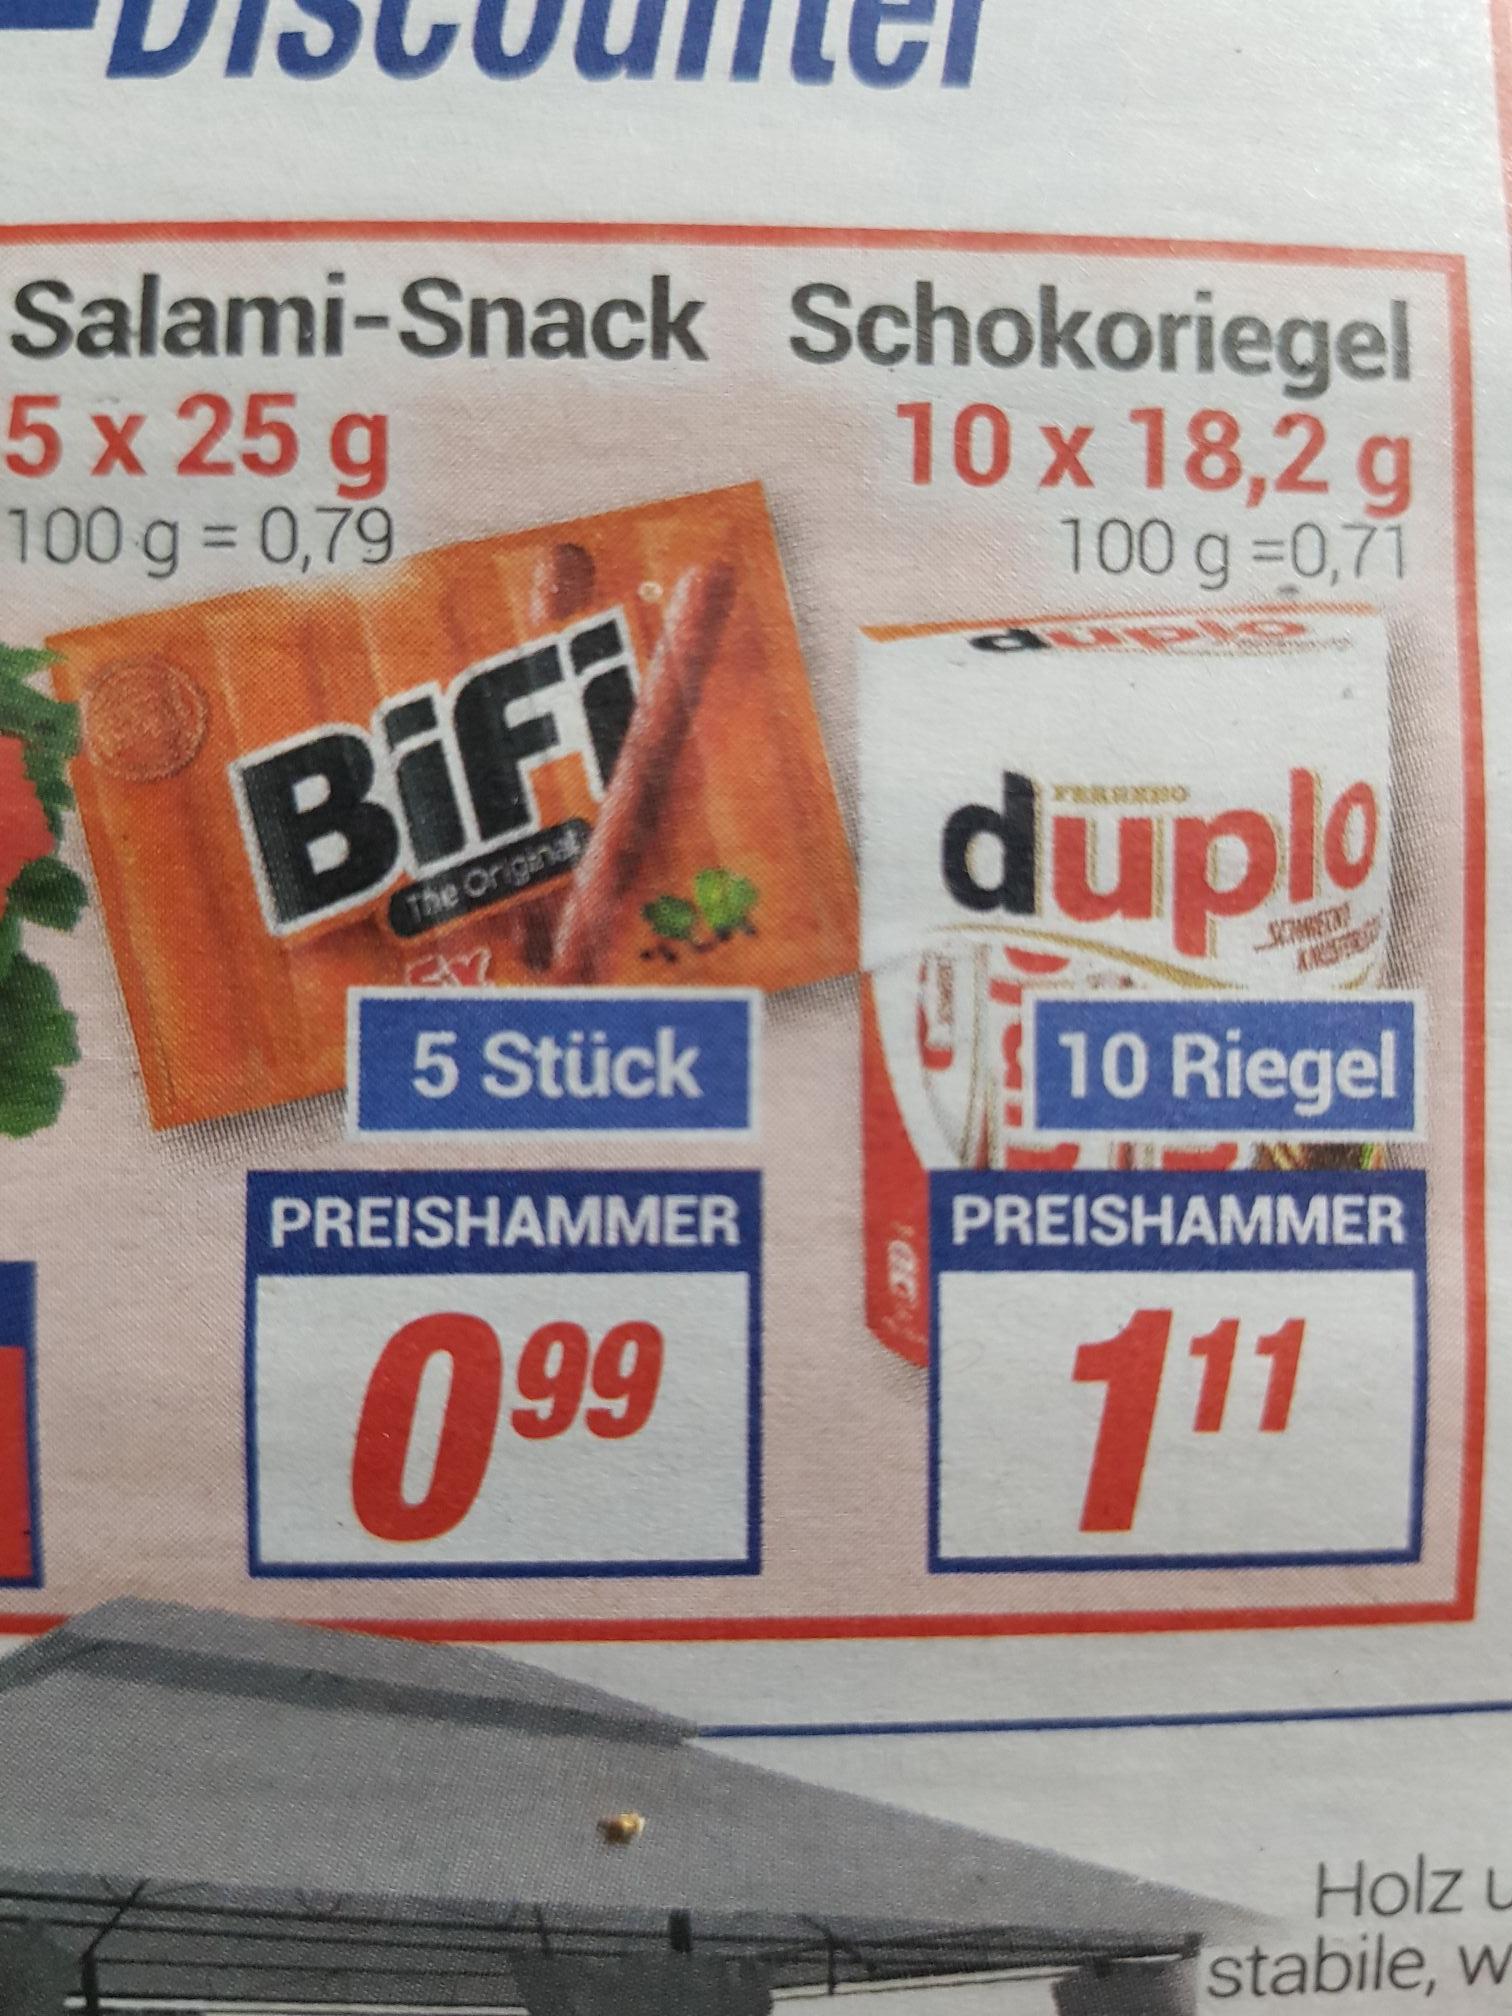 Duplo Schokoriegel 10er Pack / Bifi Salami Snack 5er Pack